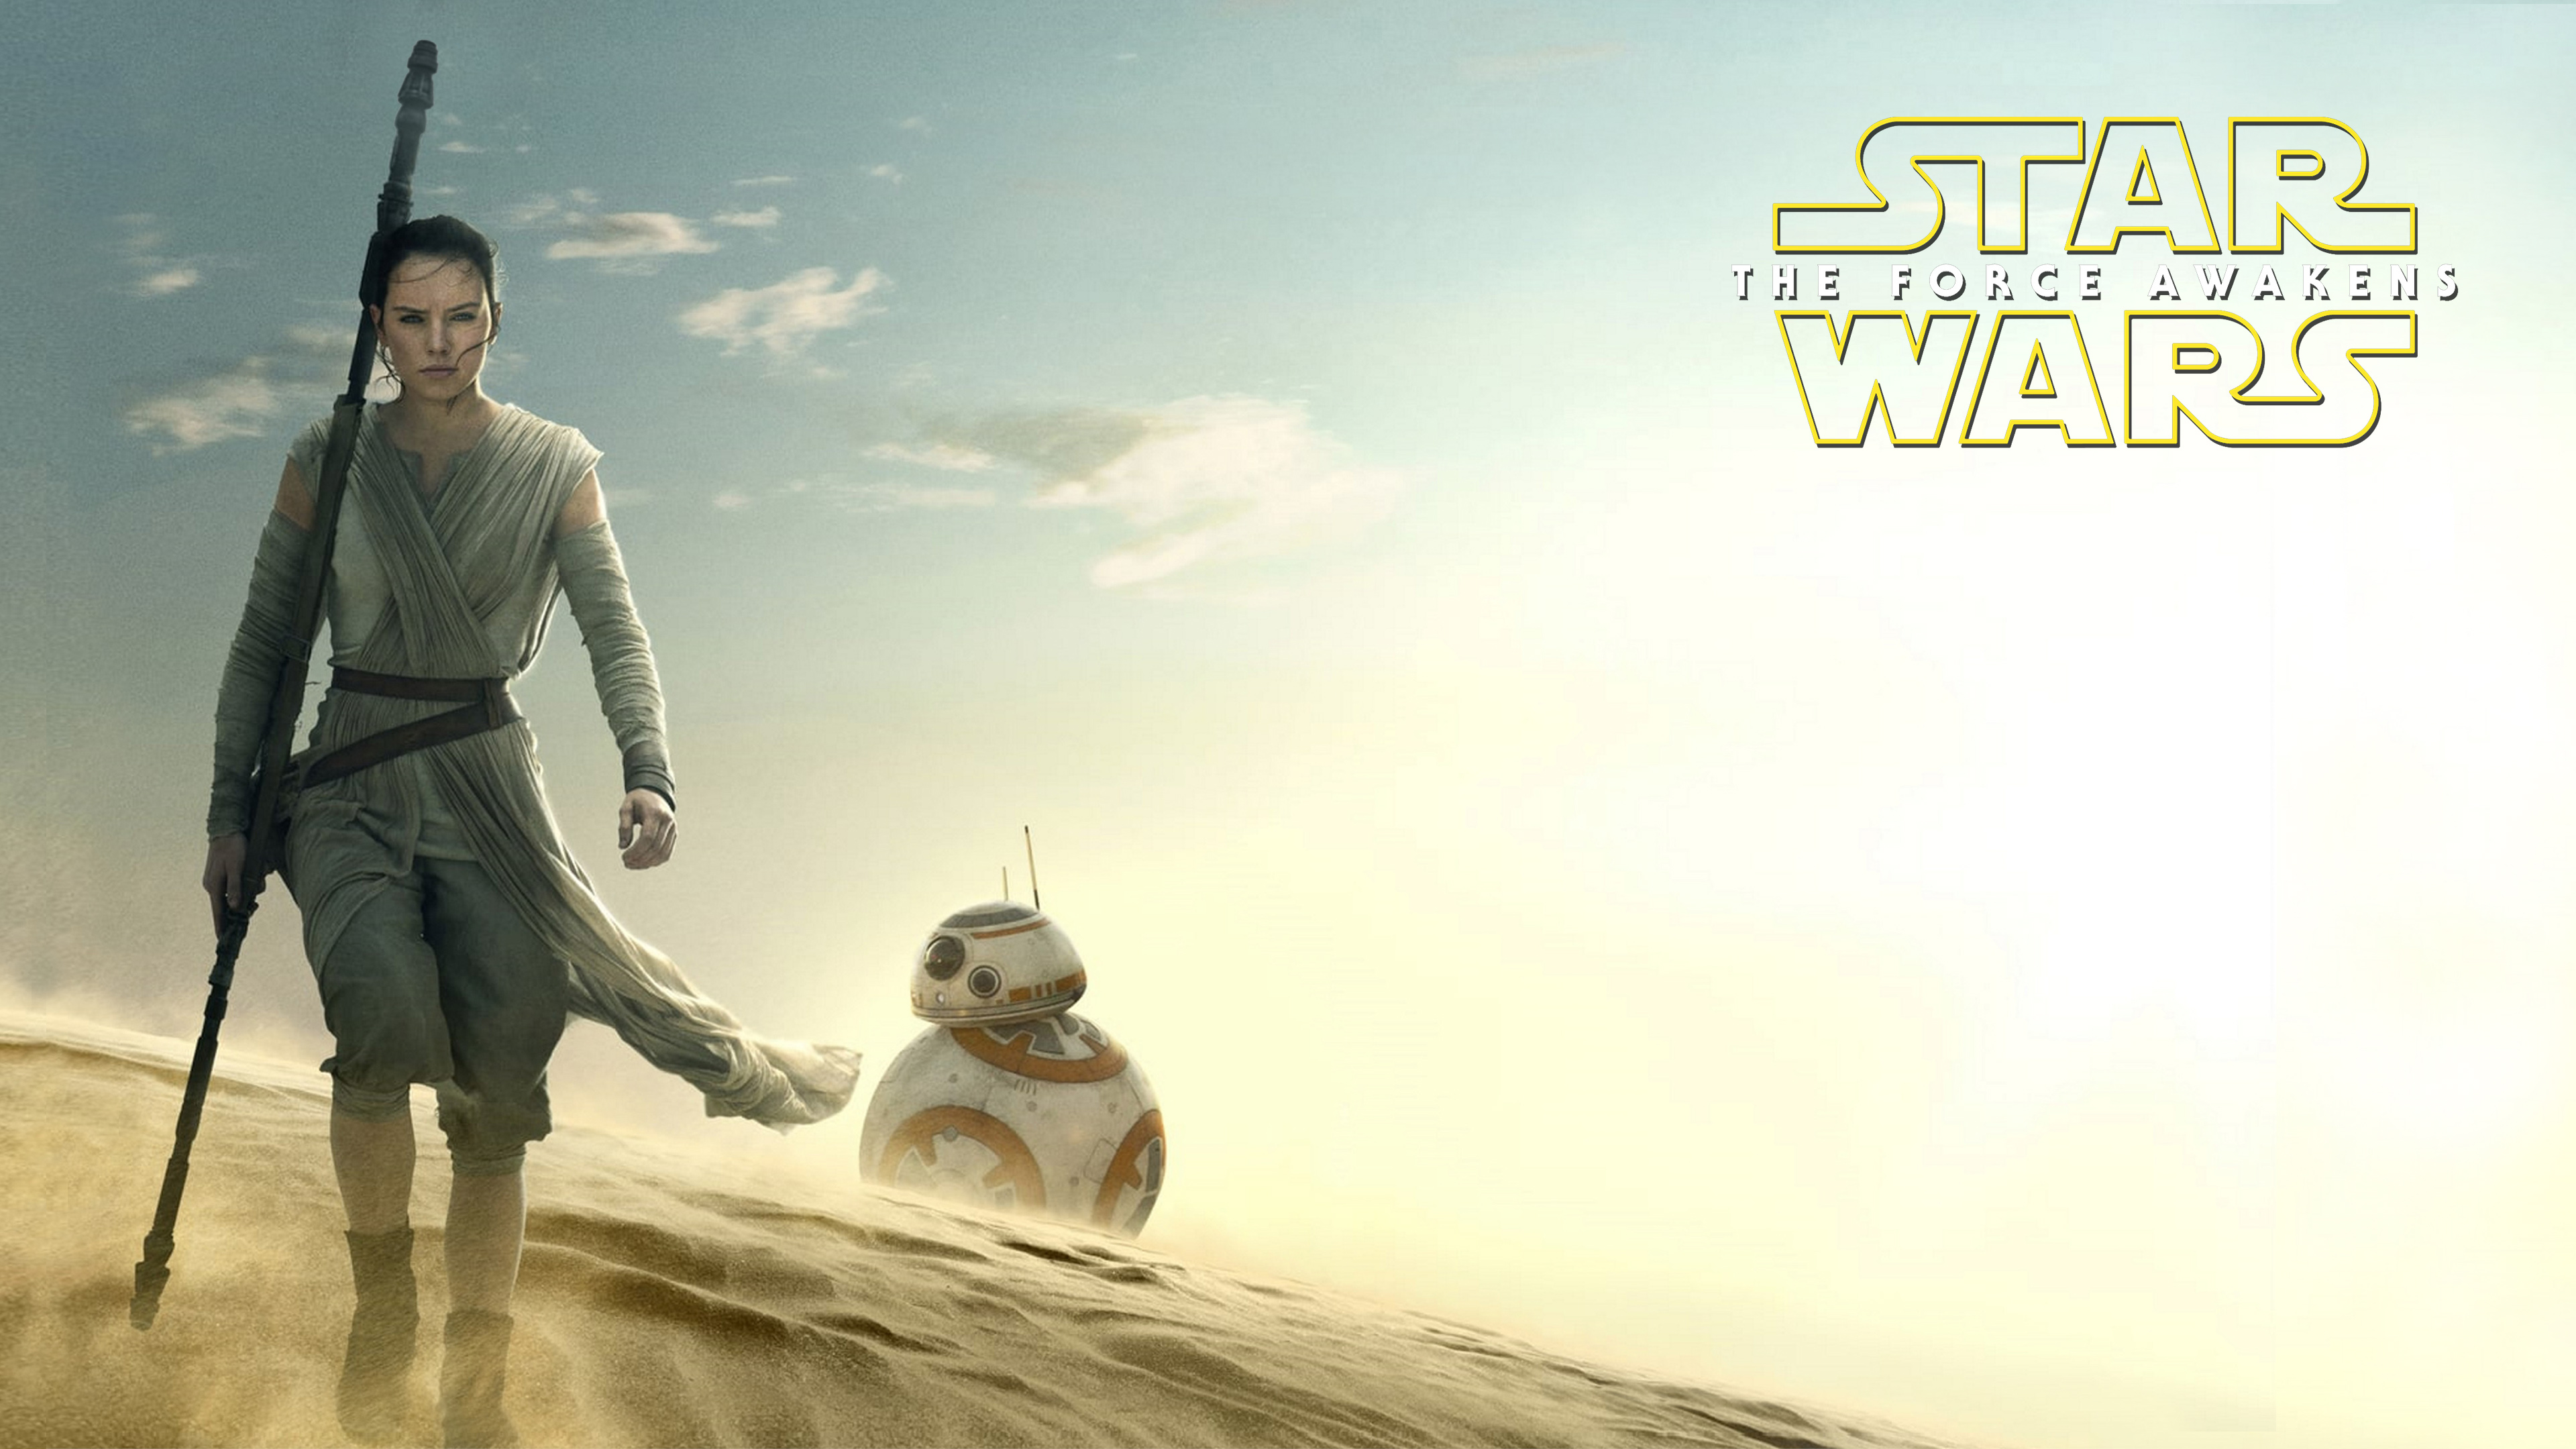 Star Wars 7 4K Wallpaper.